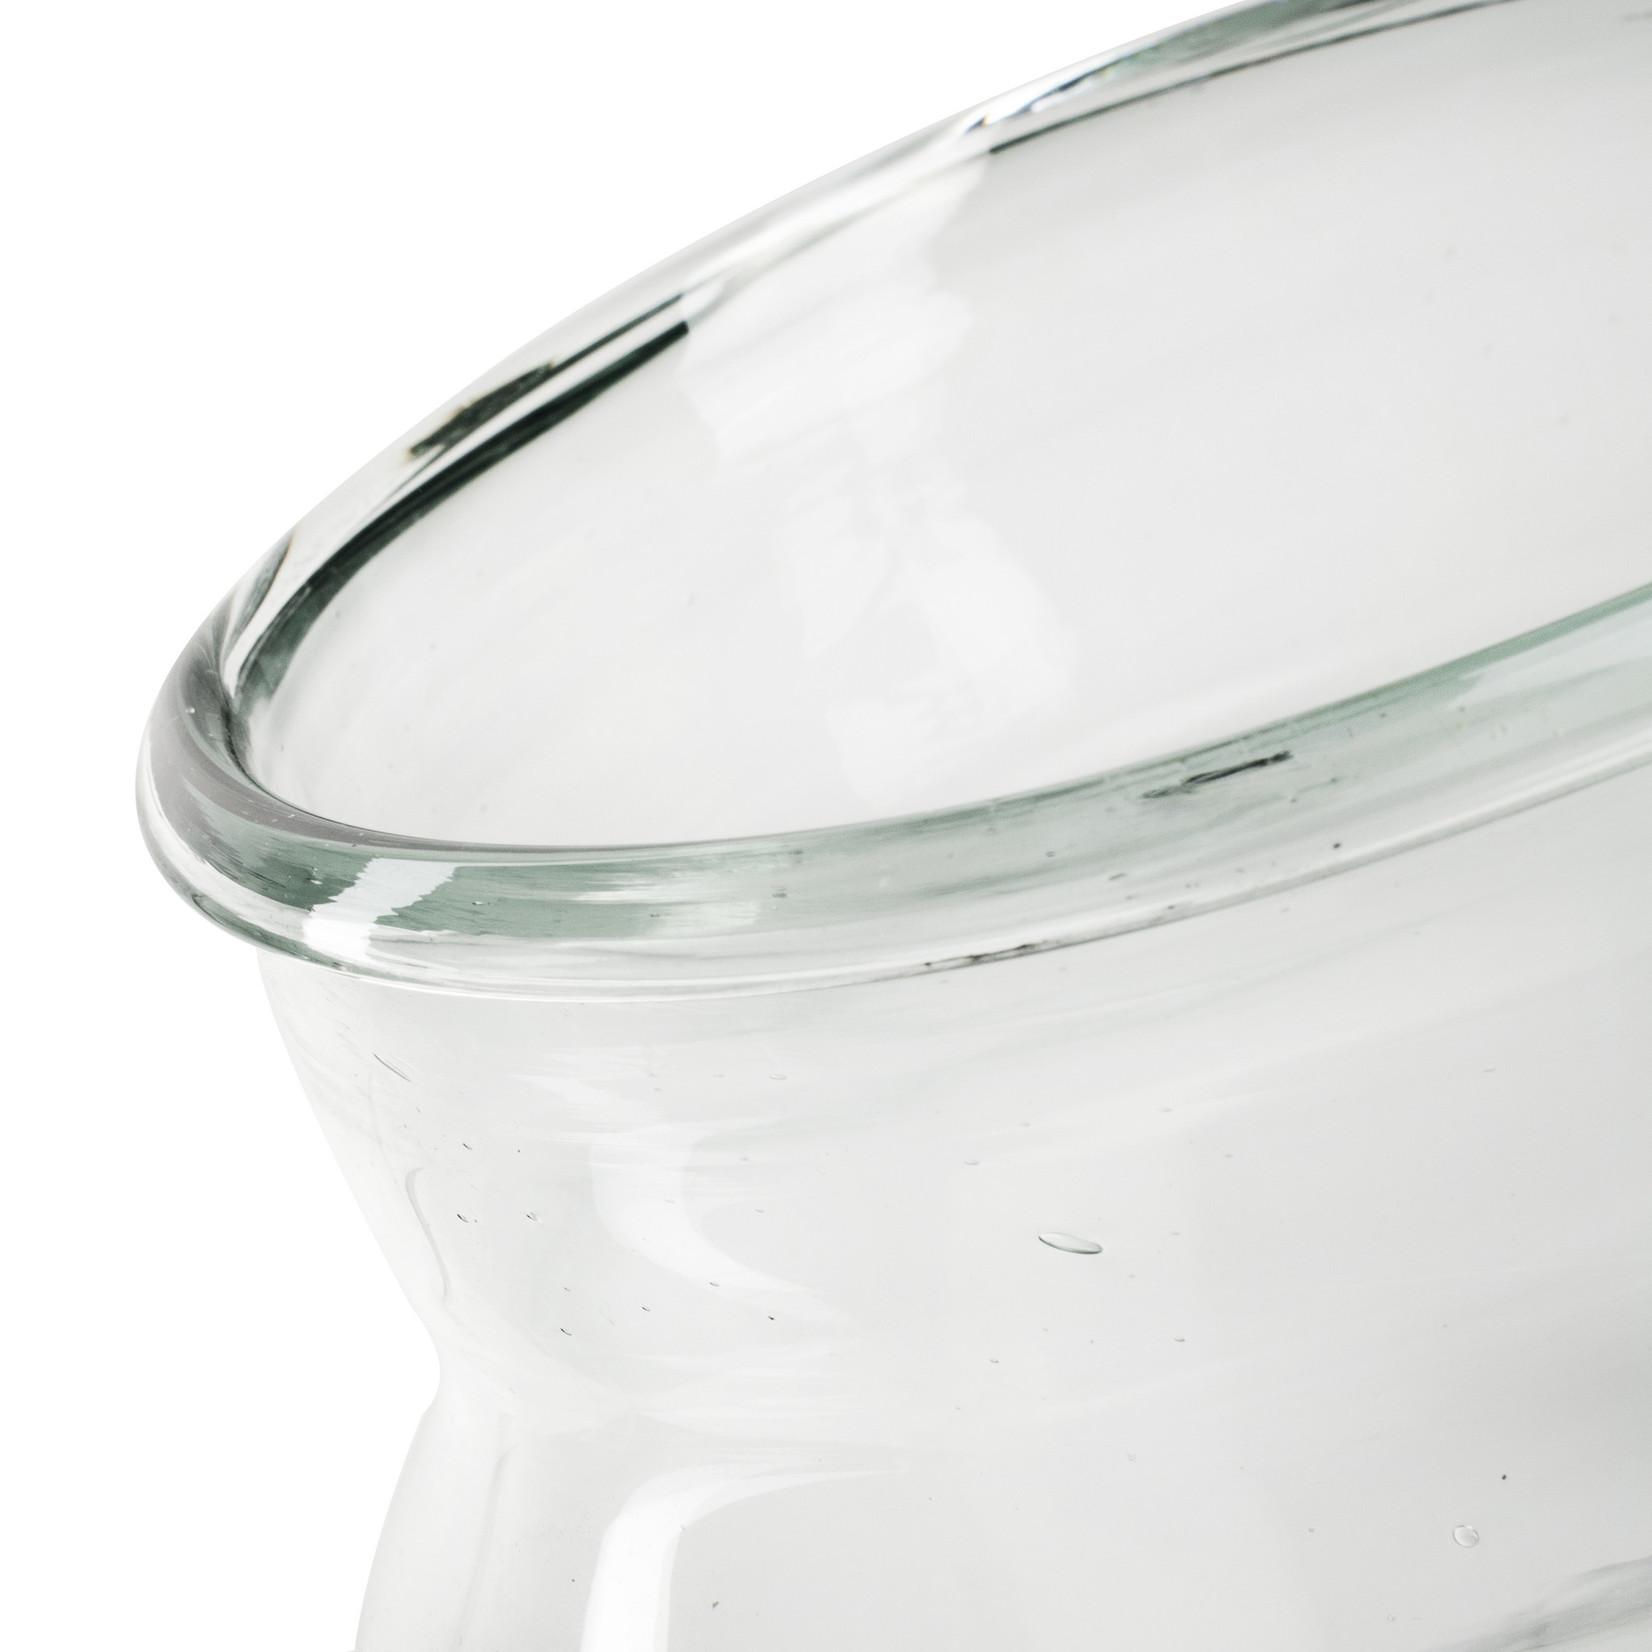 Jodeco Glass Eco vaas 'Emilian' H22 D21/17 cm Transparant